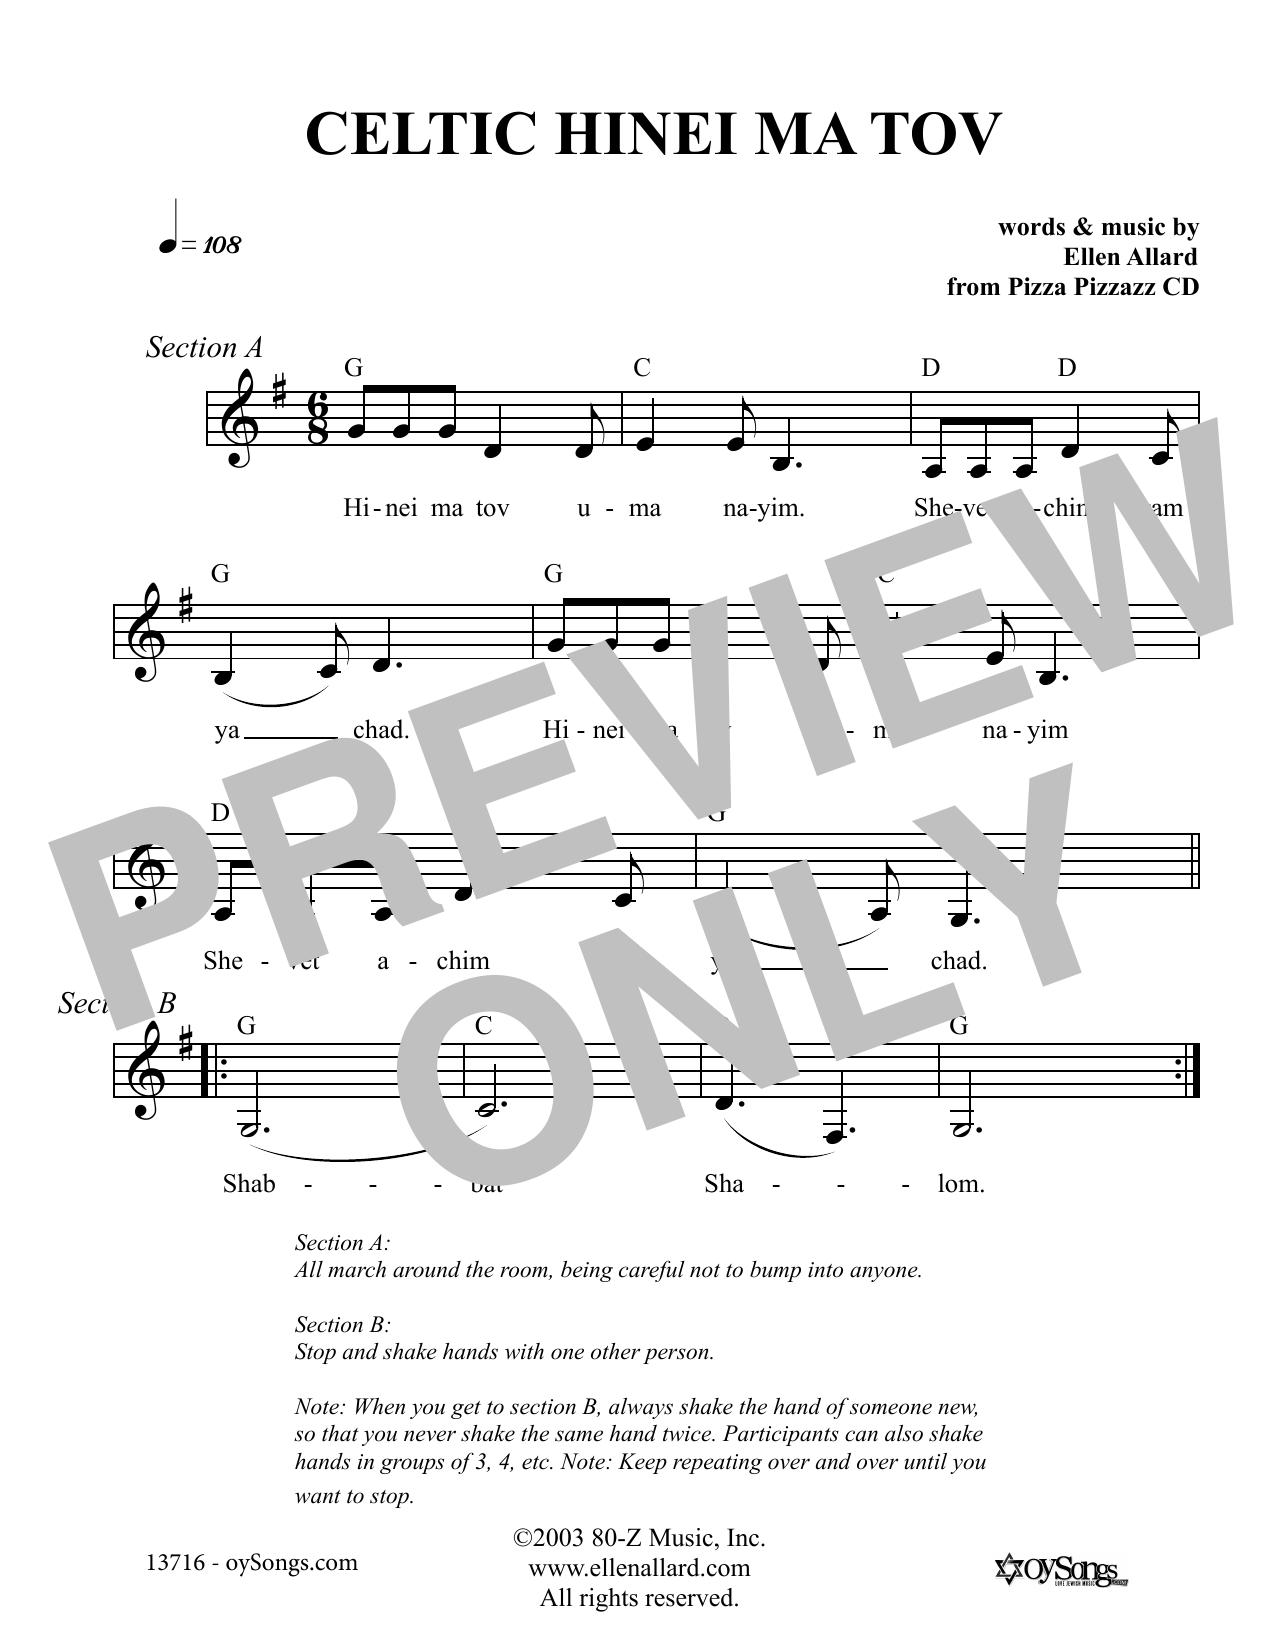 Ellen Allard Celtic Hinei Ma Tov sheet music notes and chords. Download Printable PDF.